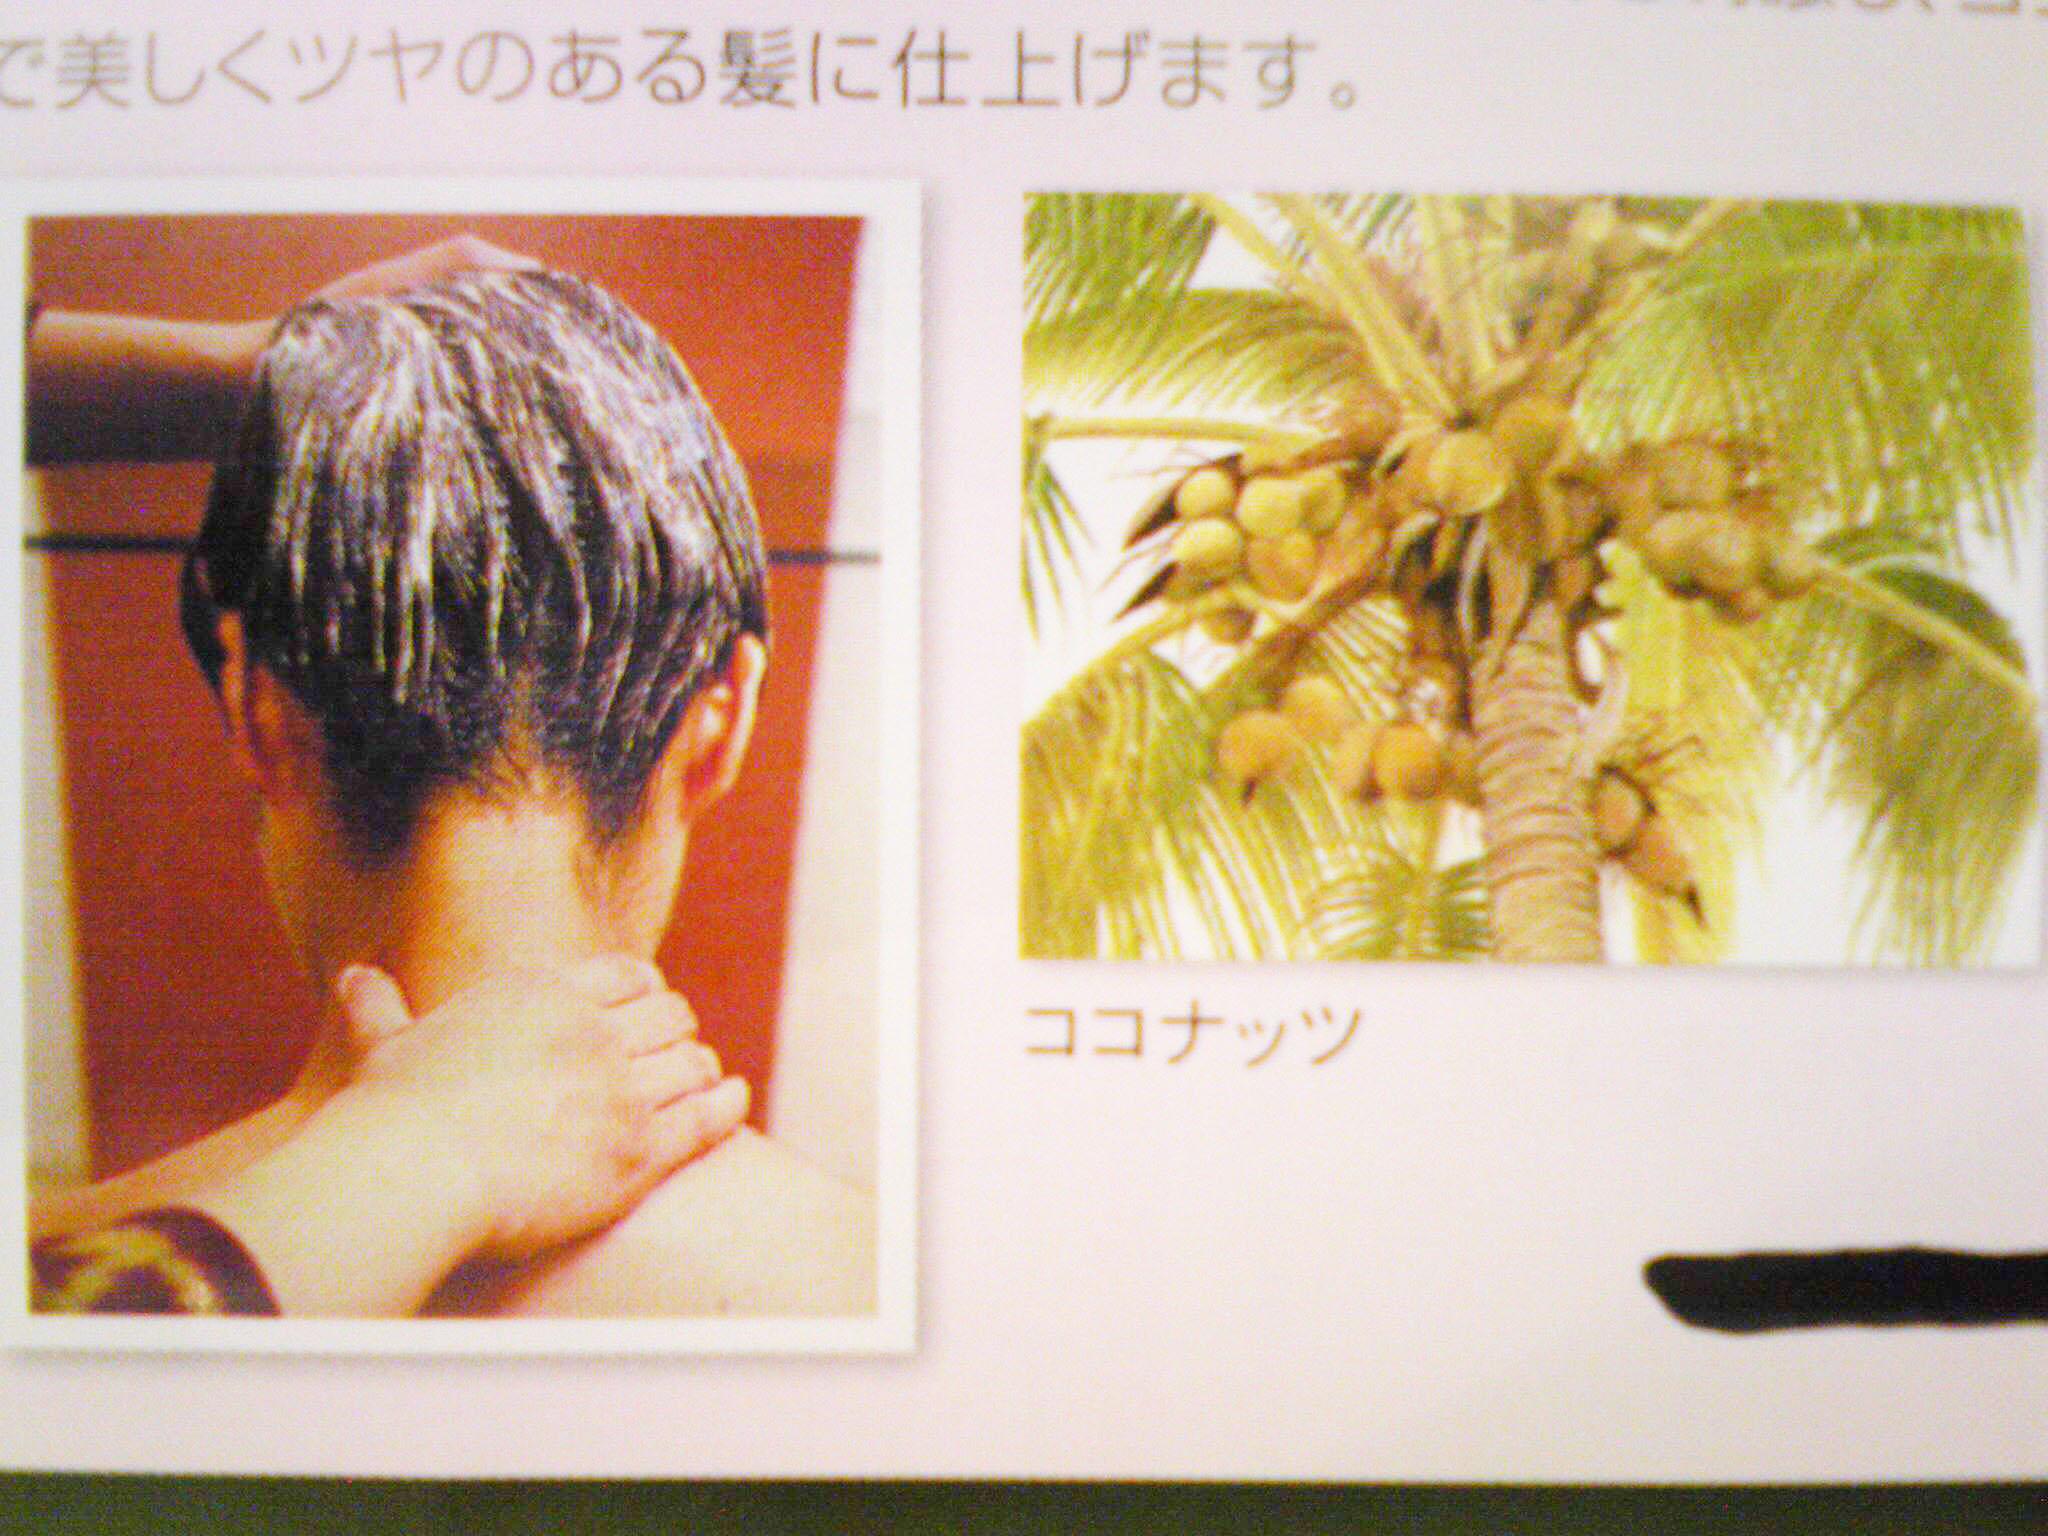 http://luce-hair.net/wp-content/uploads/2011/04/pic1.jpg